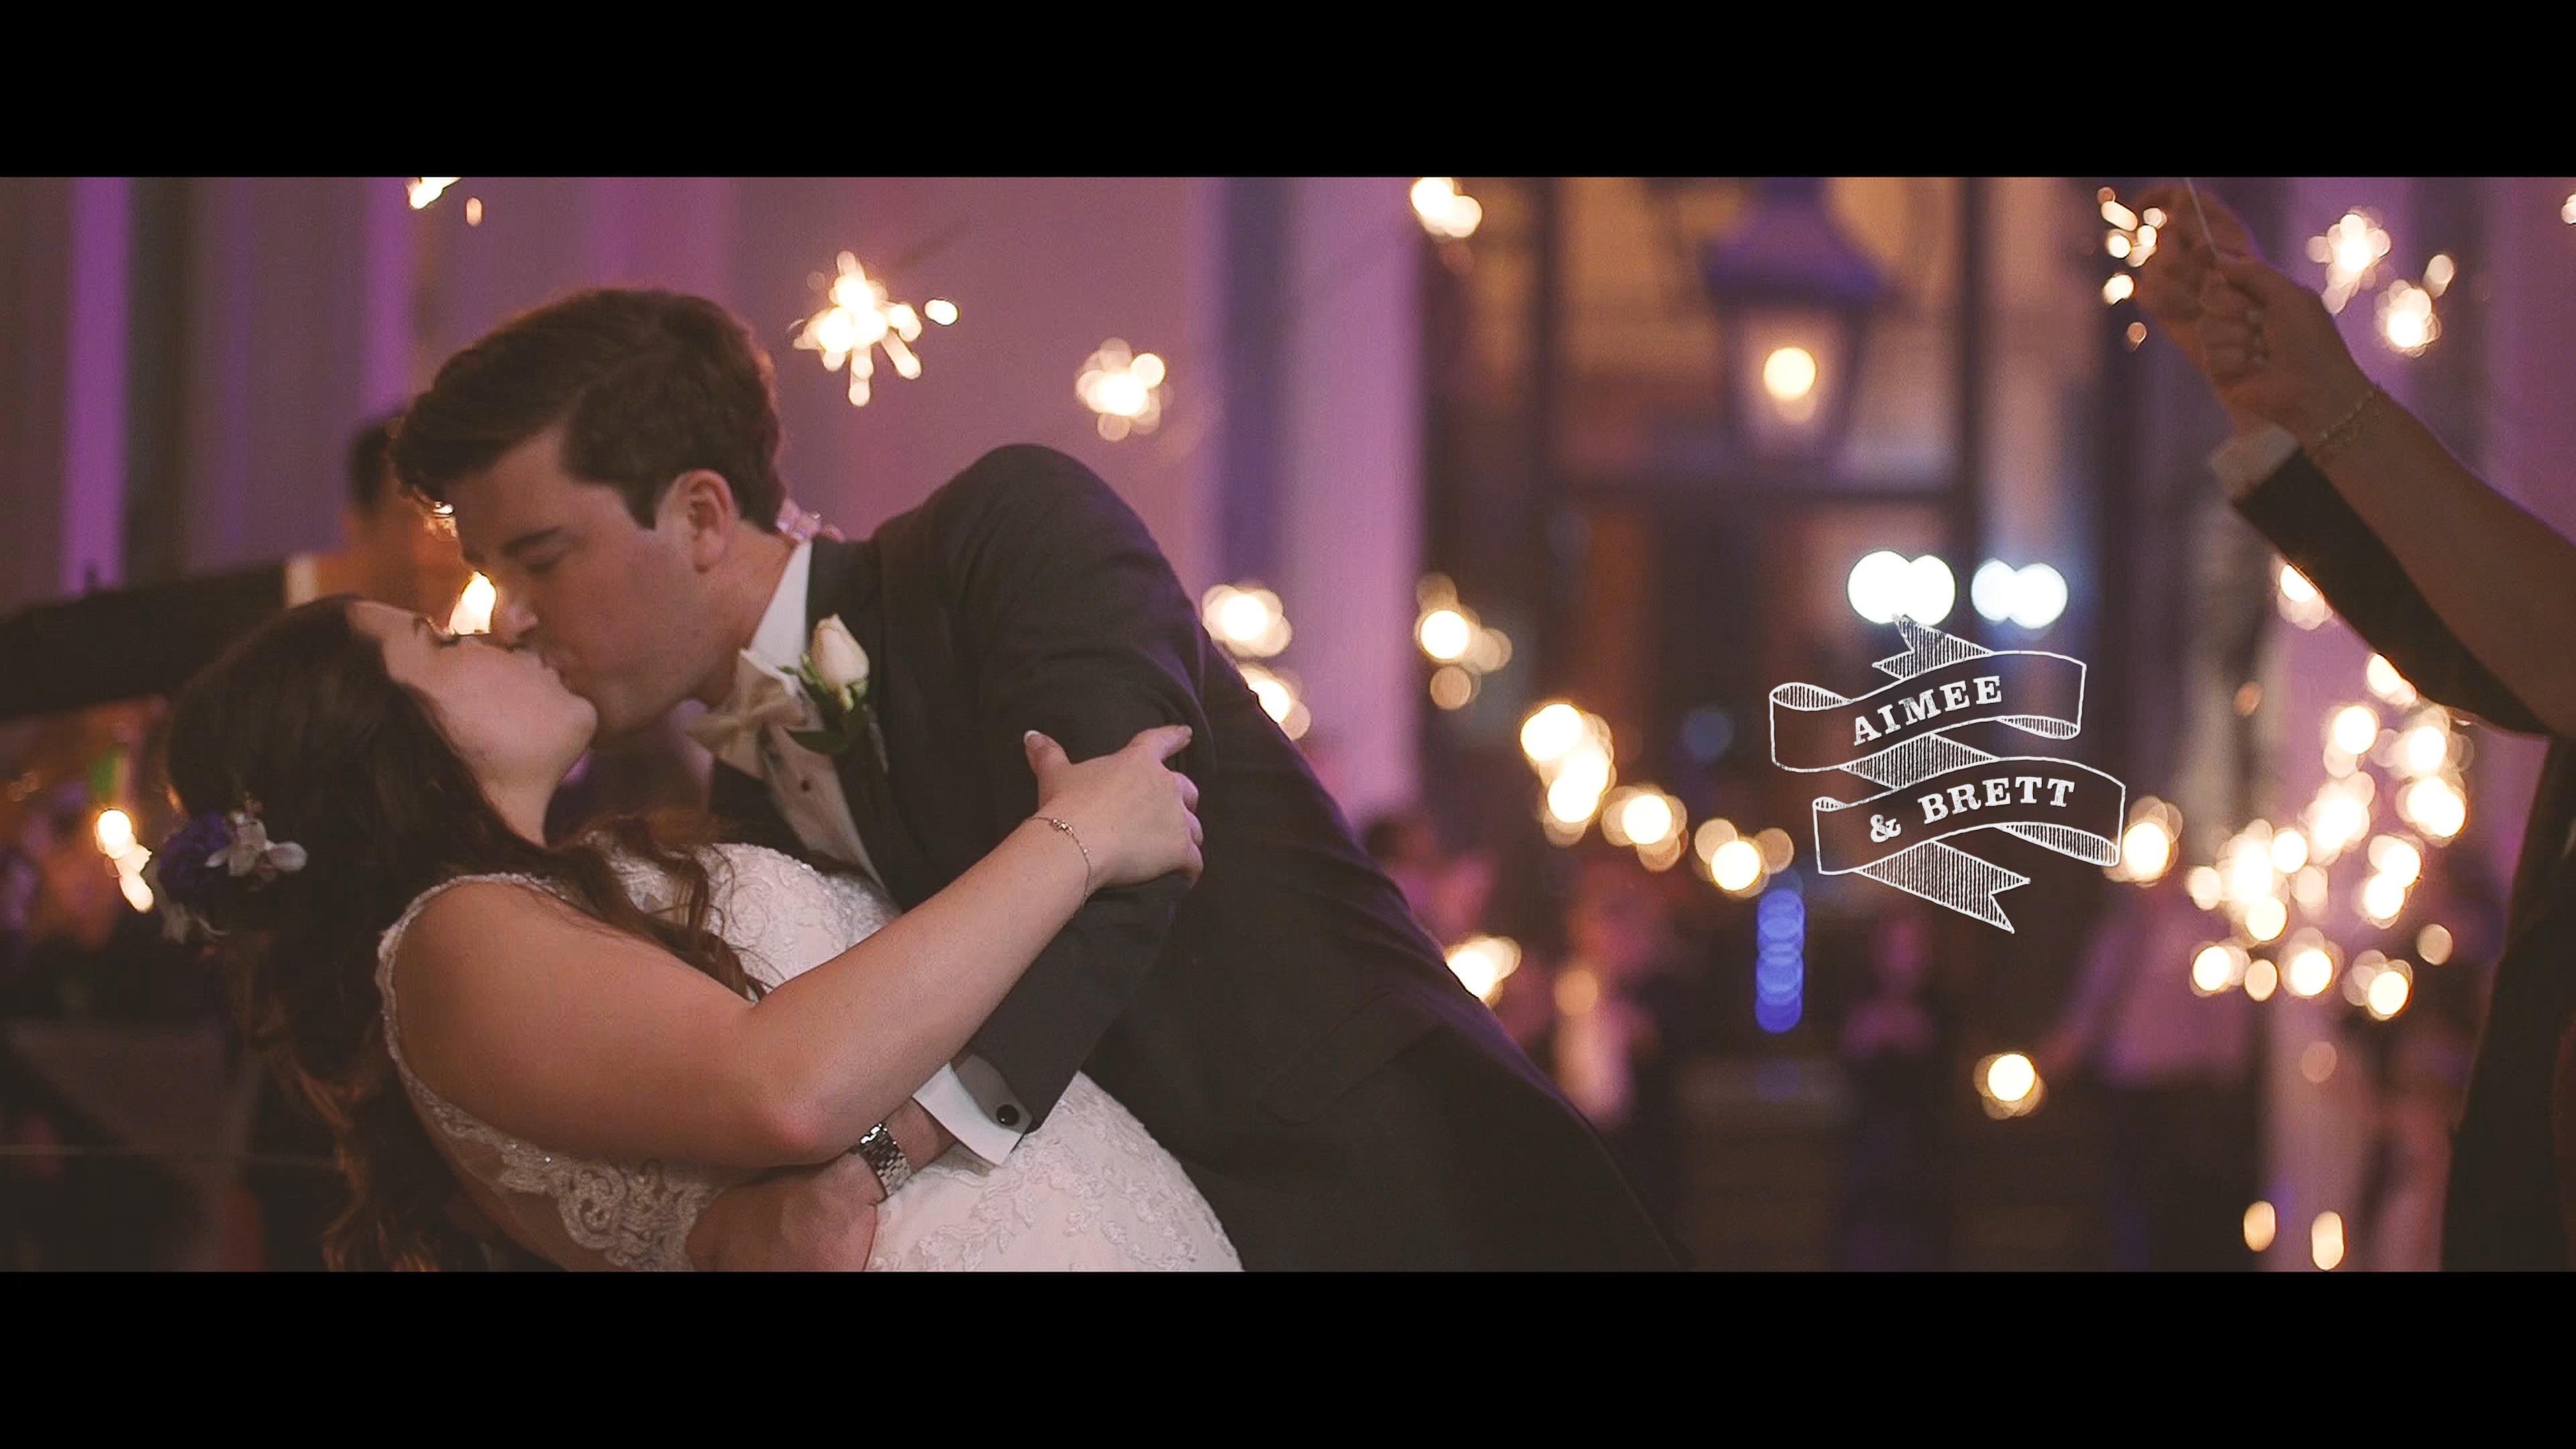 Aimee + Brett | New Orleans, Louisiana | New Orleans Board of Trade